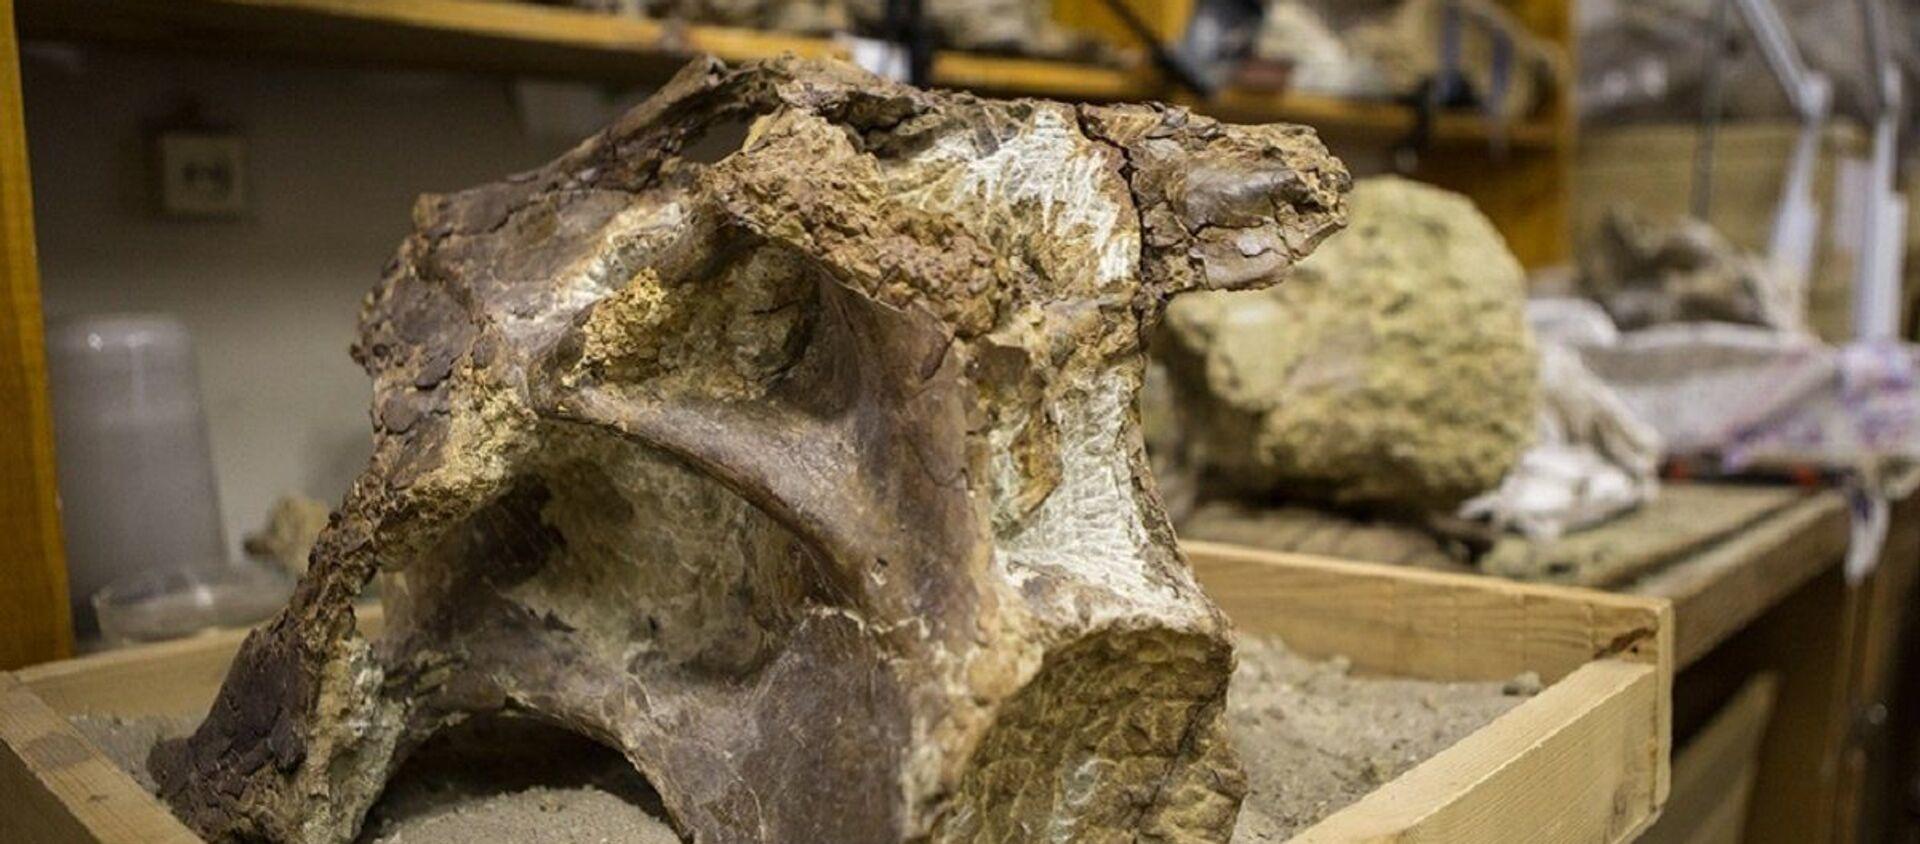 Skamieniałości dinozaura Sibirotitan astrosacralis - Sputnik Polska, 1920, 15.01.2018